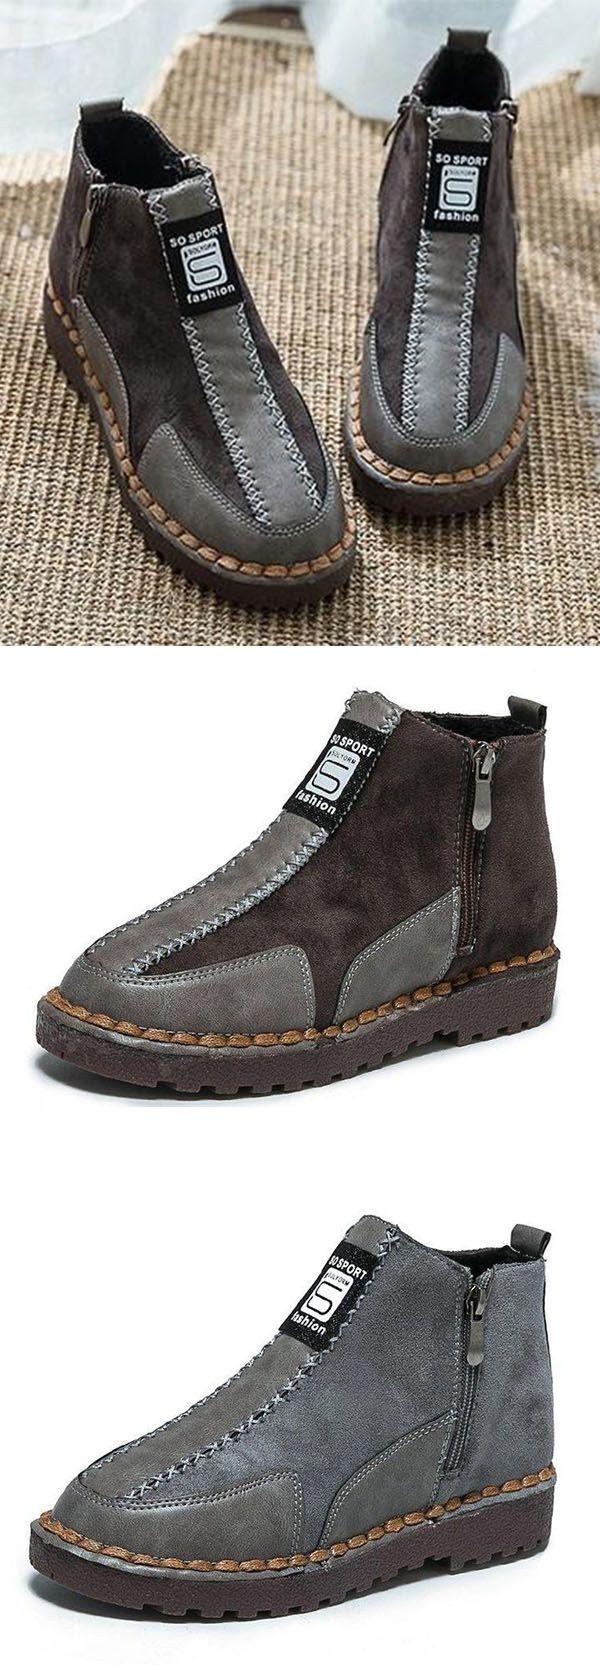 f6fdab13af8d Buy 3 Enjoy 8% OFF Now! (Code  8OFF) Womens Platform Flat Bottom Martin  Sneakers Ankle Boots